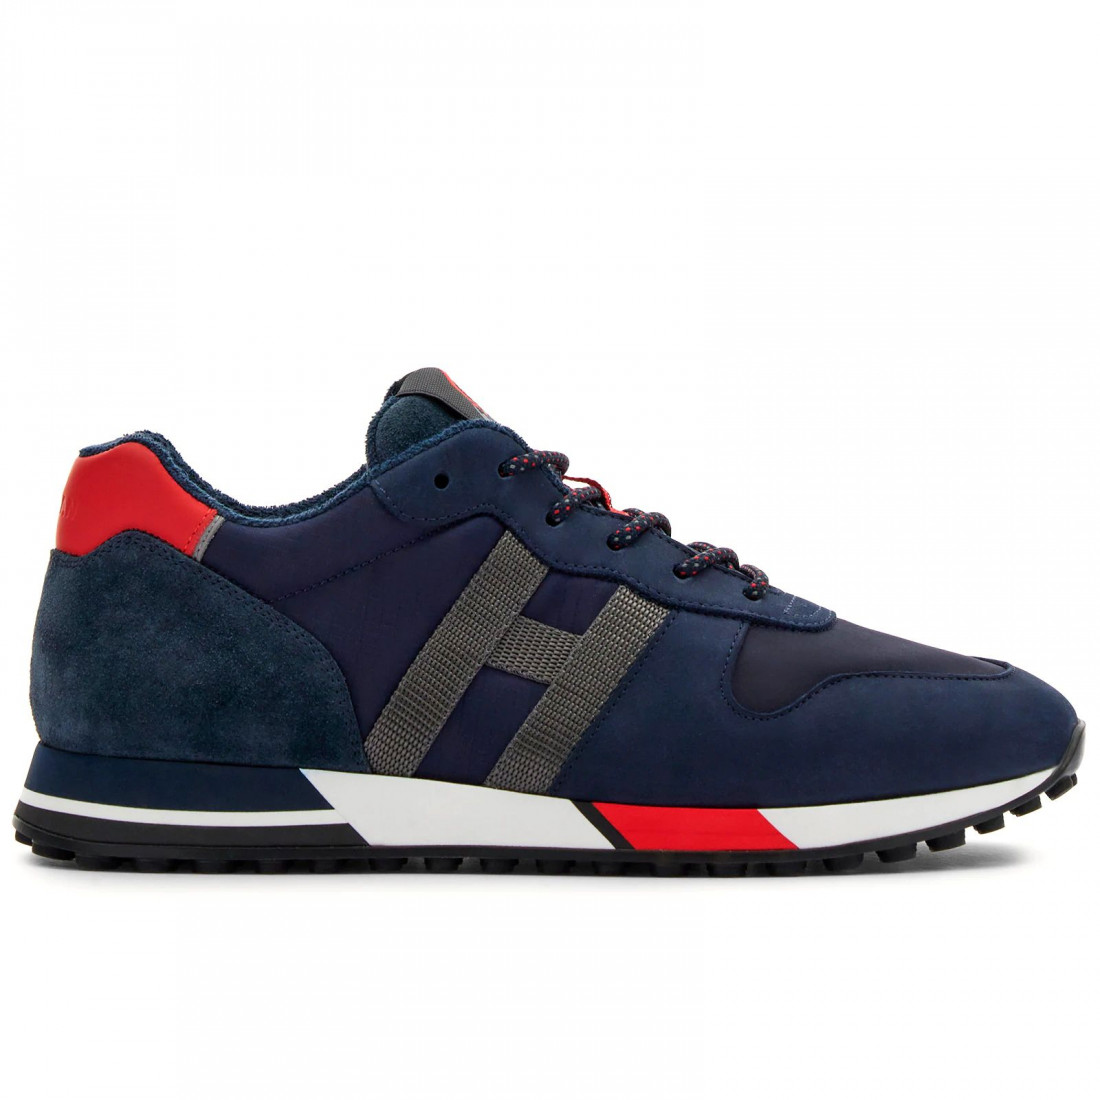 sneakers uomo hogan hxm3830an51pgi617s 8216